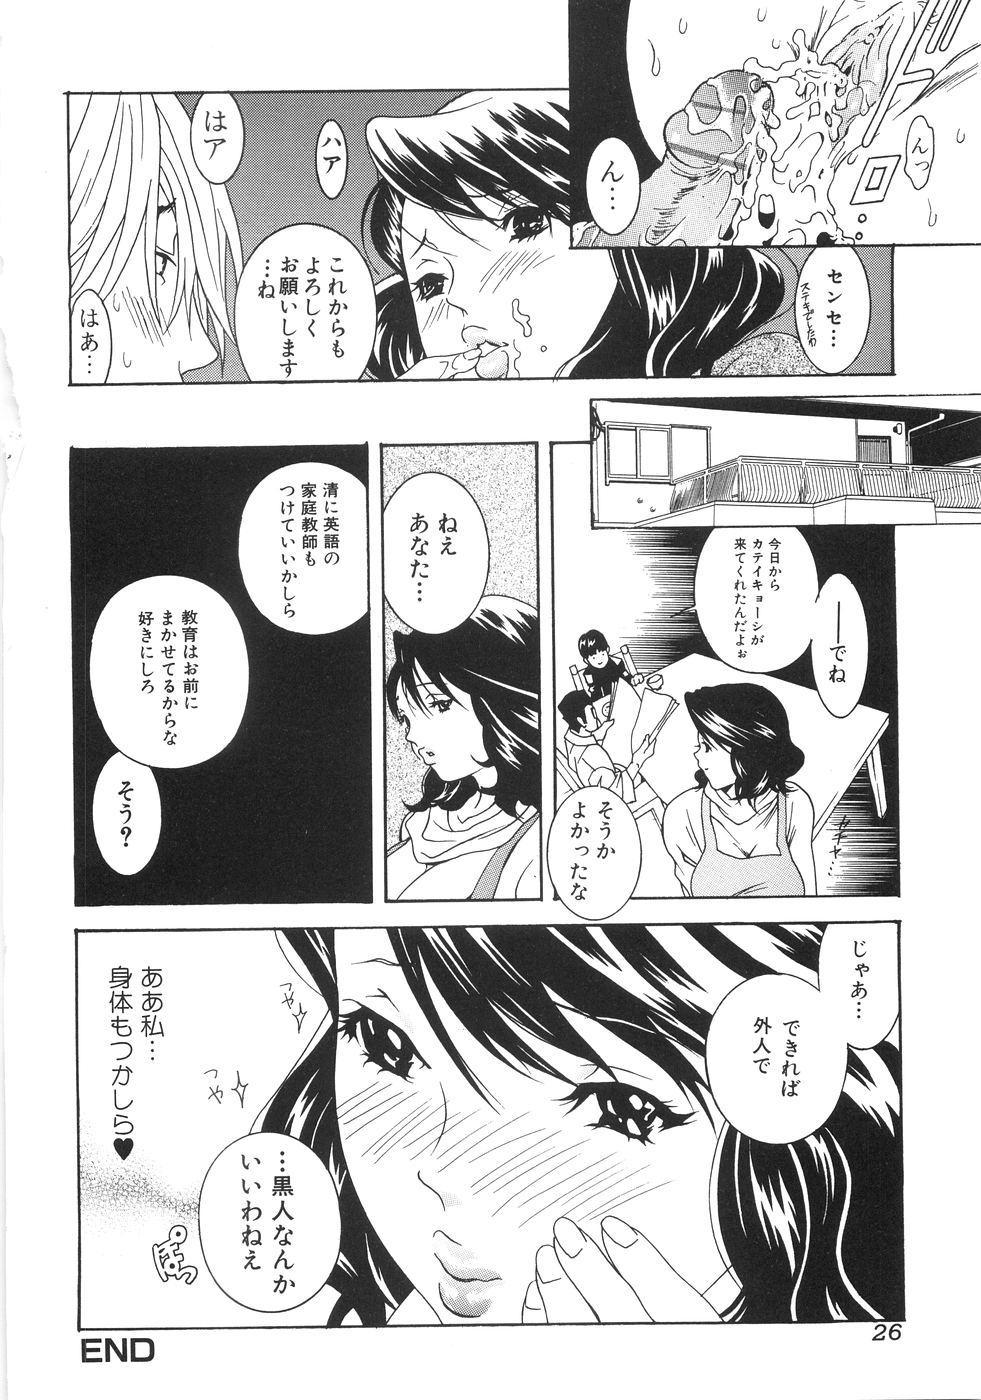 Honki Jiru - Cowper's Gland Liquid? or Love Juice?...?! 26